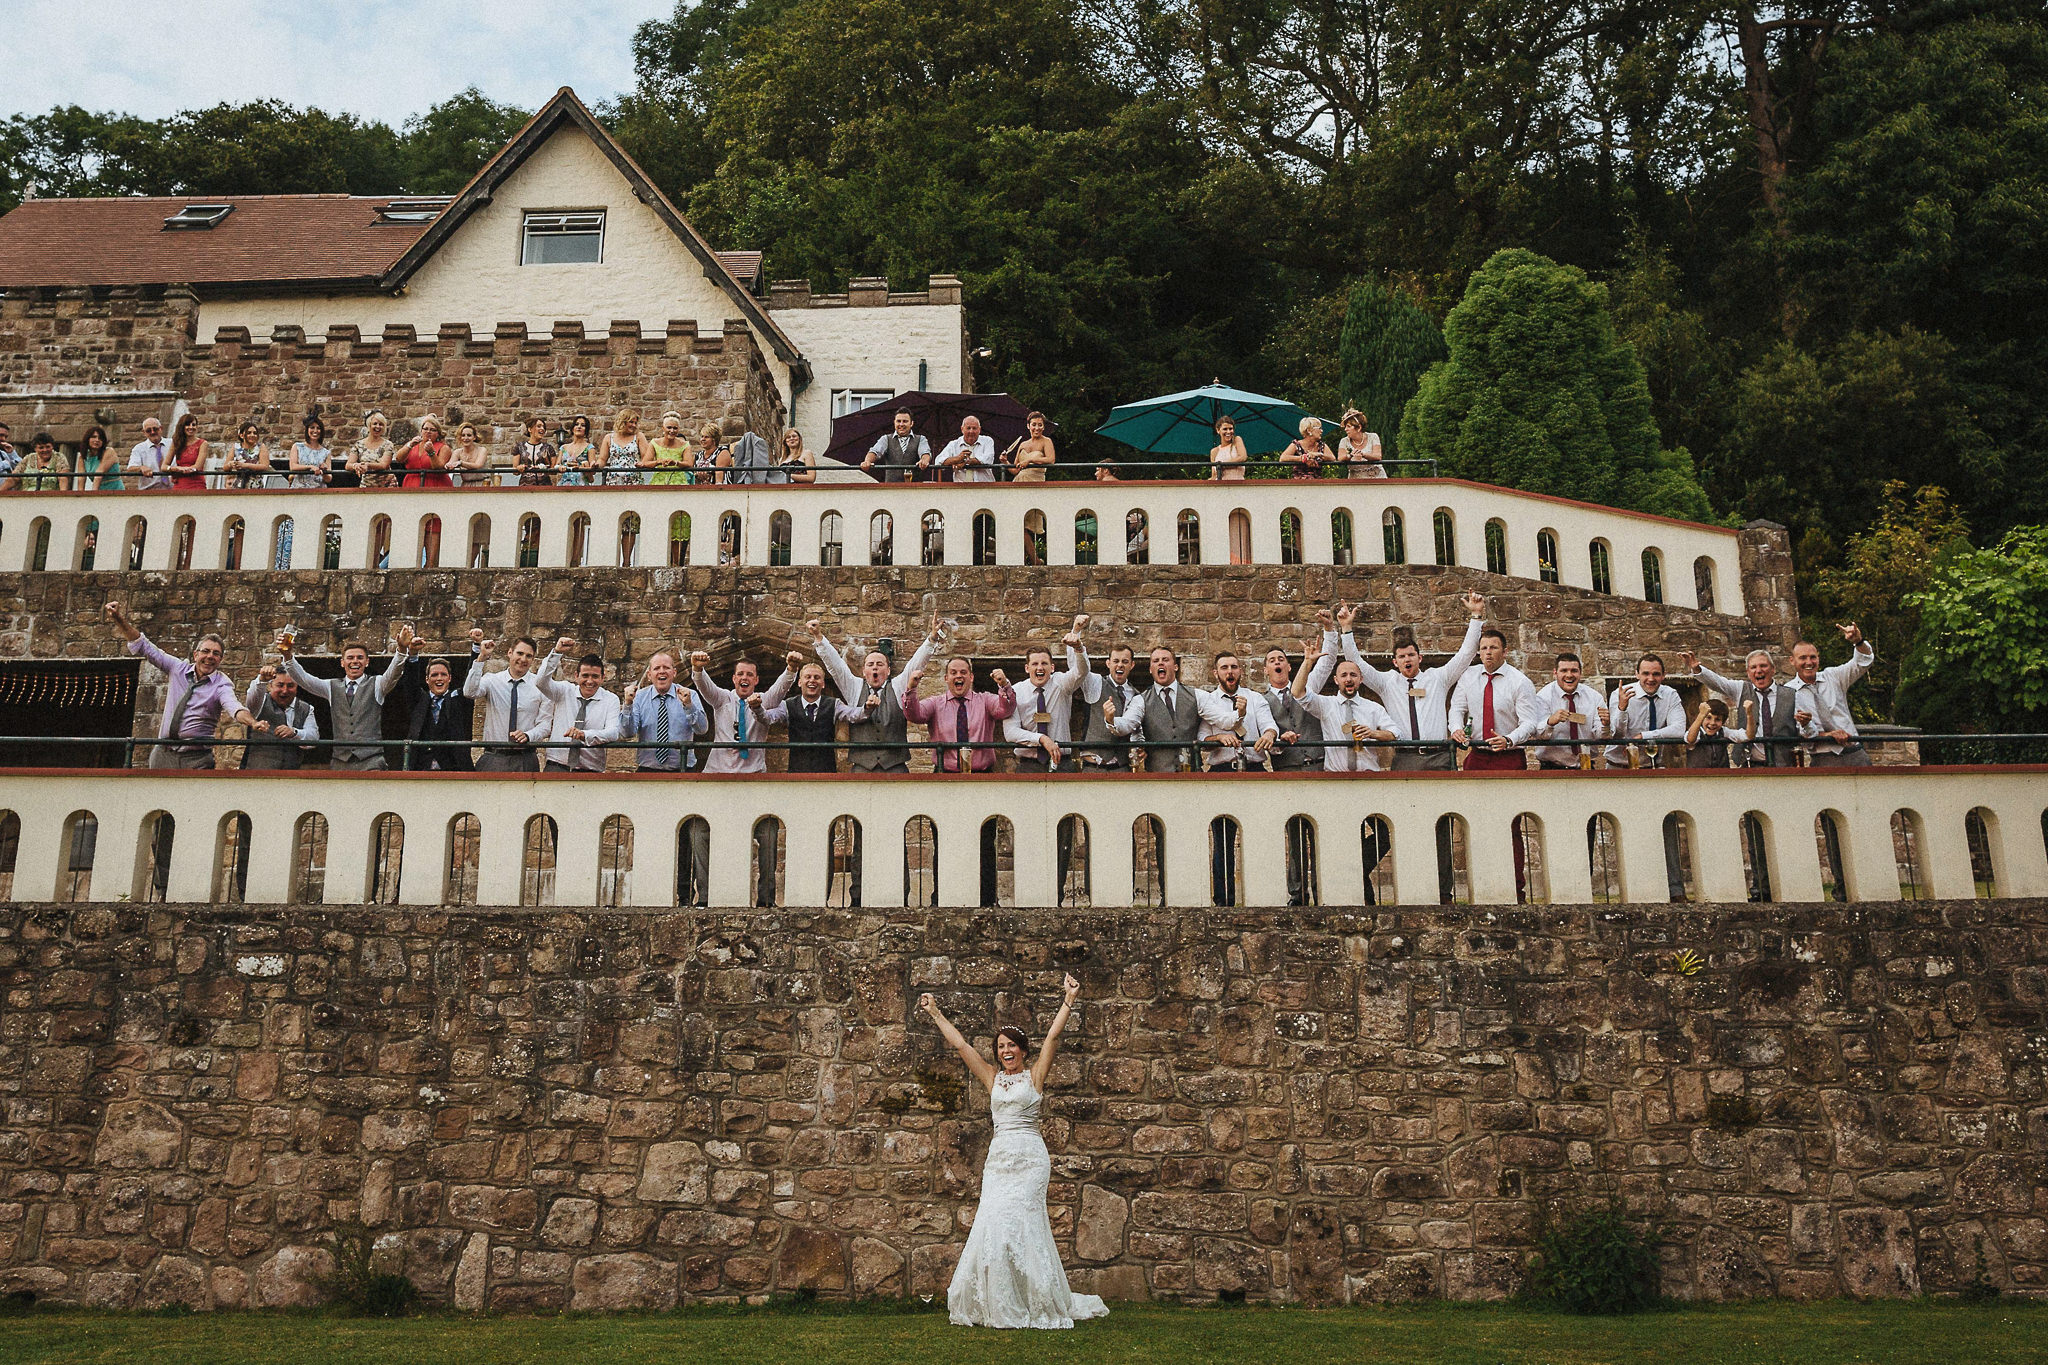 paul-marbrook-Caer-Llan-Wedding-Photographer-90086